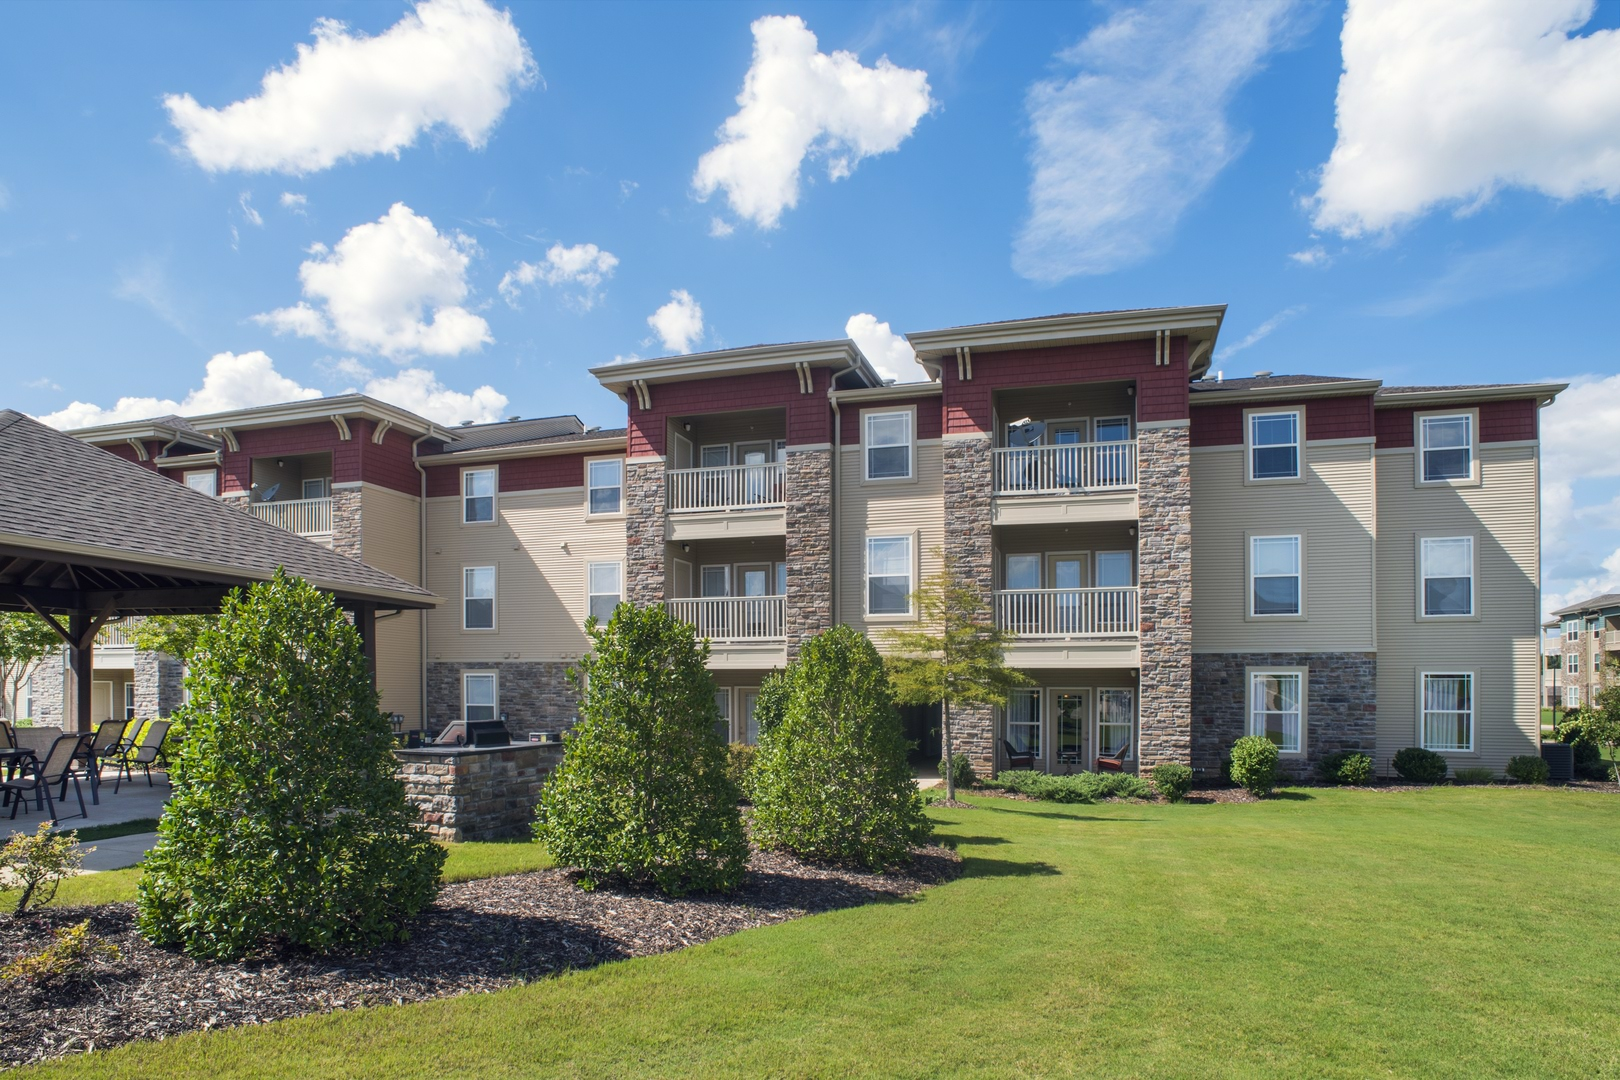 Apartments for Rent in Huntsville, AL | Addison Park - Home